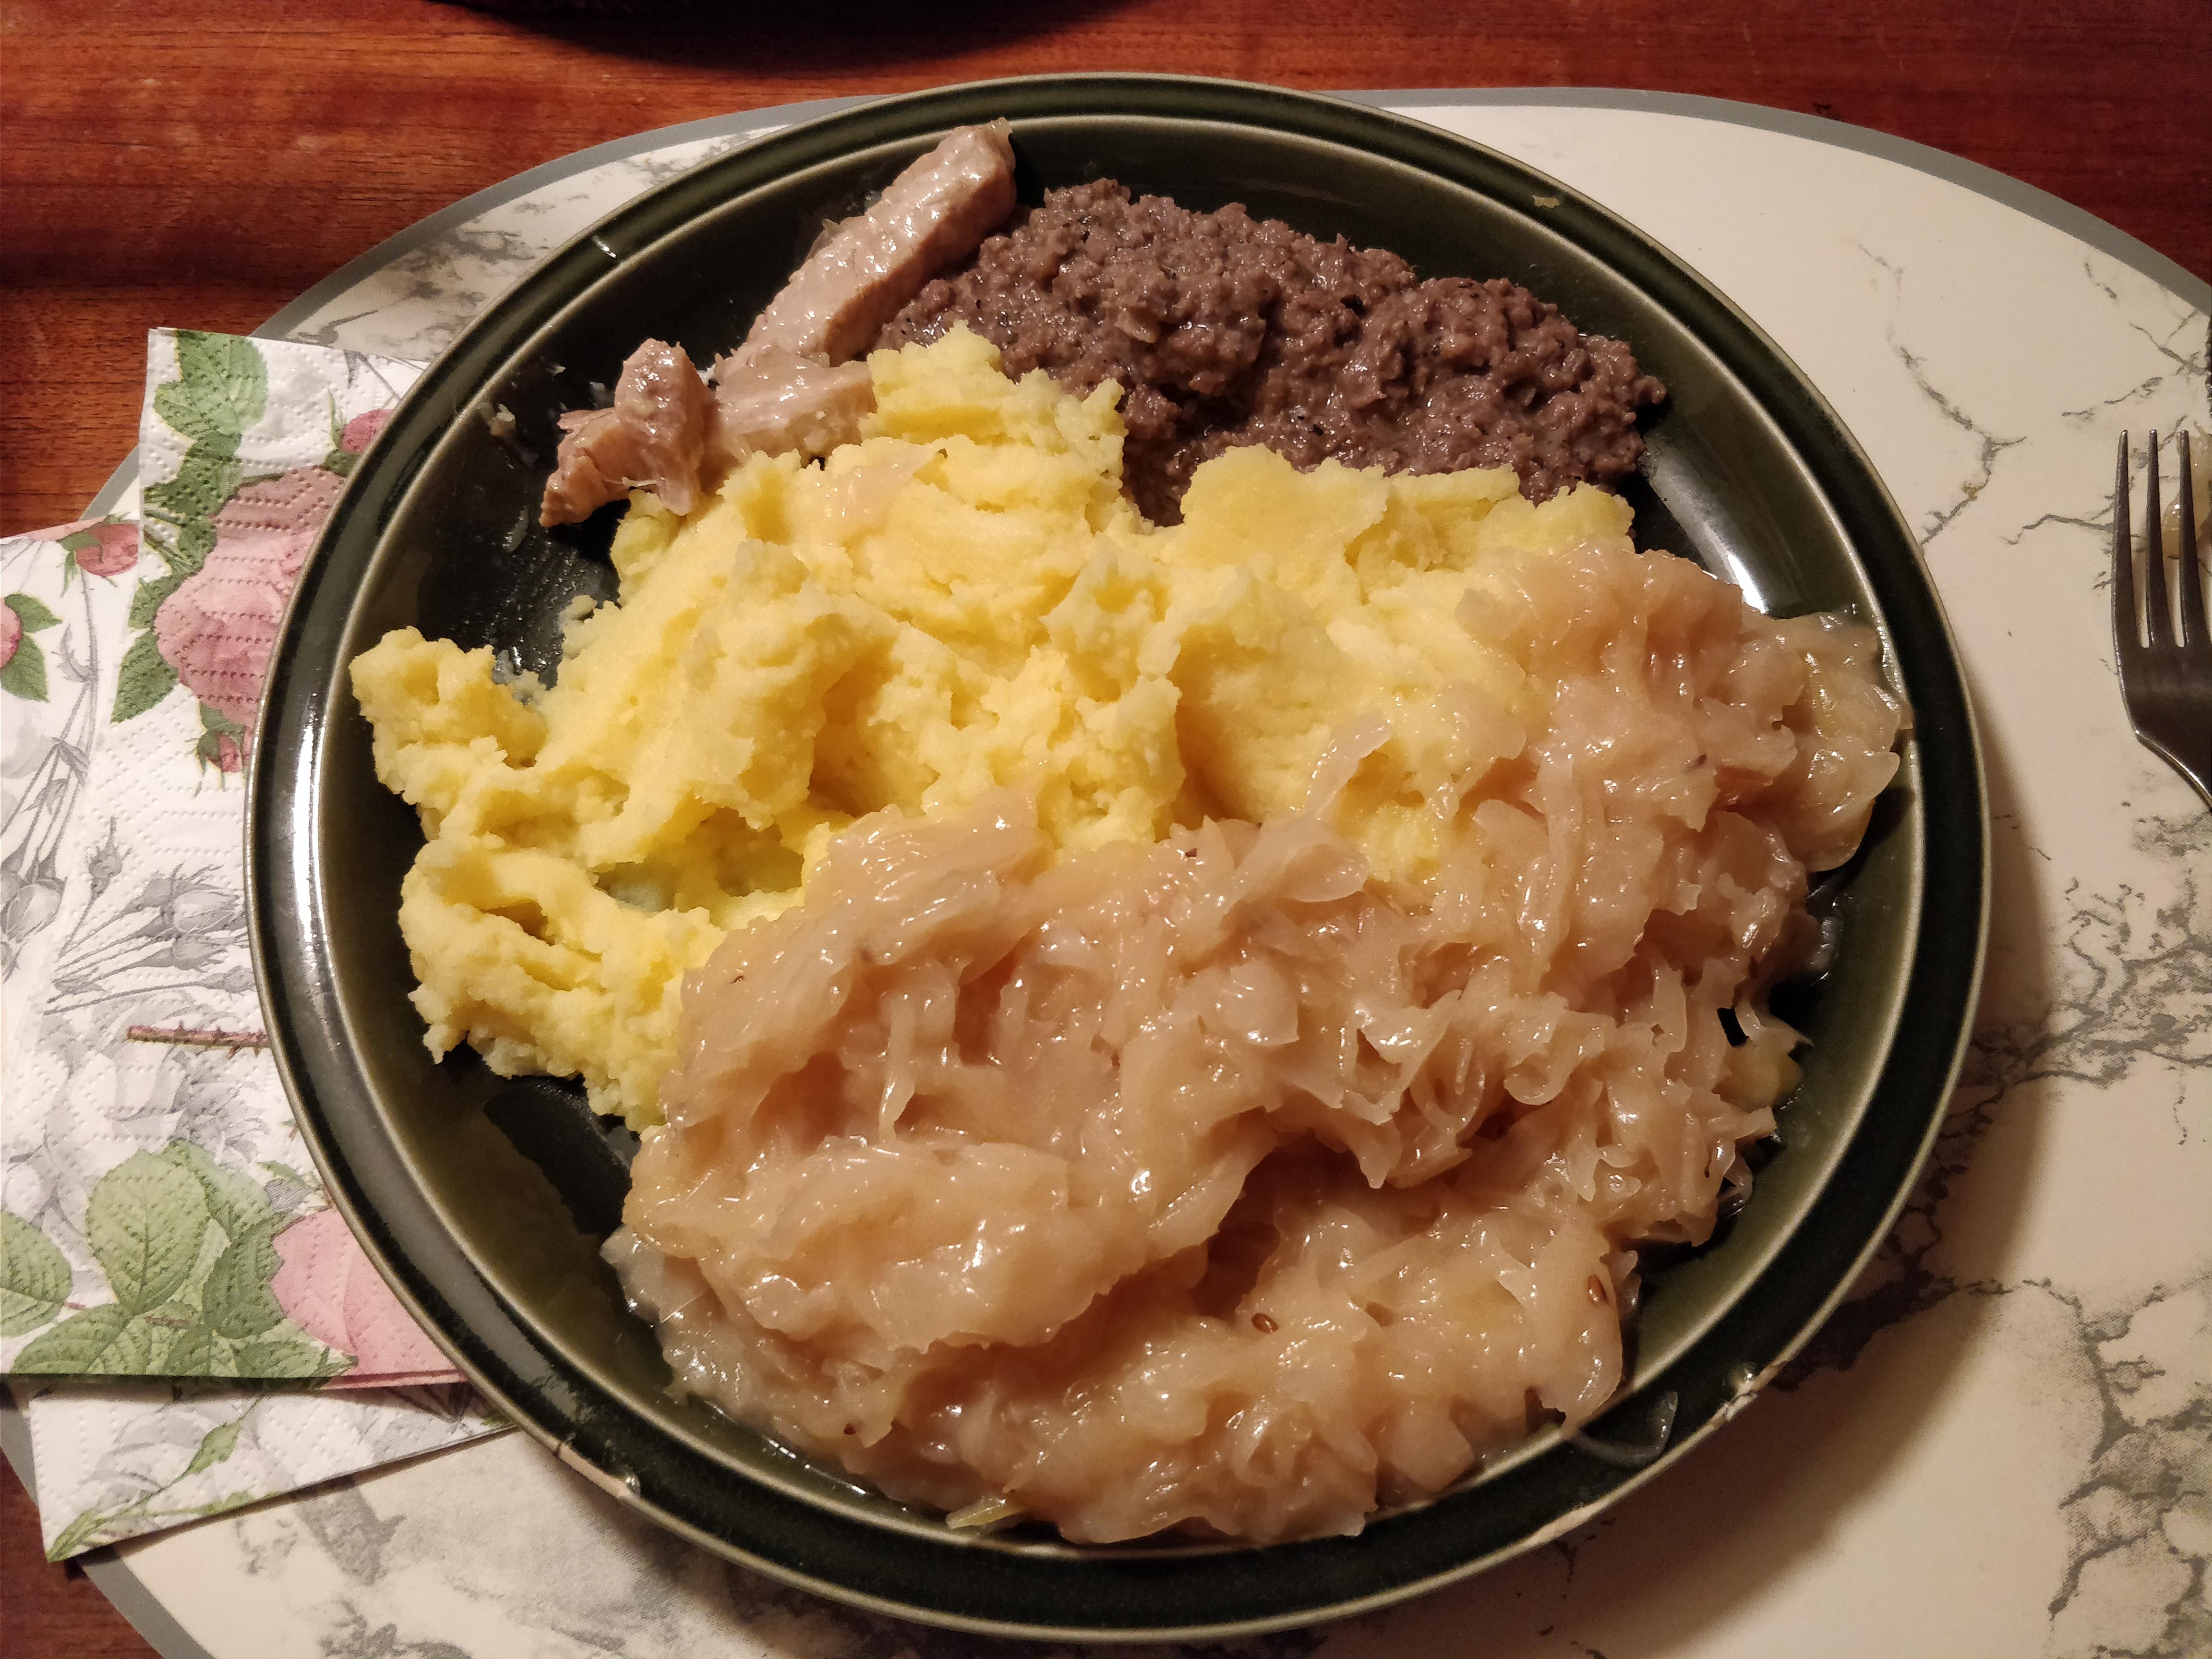 http://foodloader.net/nico_2017-11-15_leberwurst-sauerkraut-kartoffelbrei.jpg